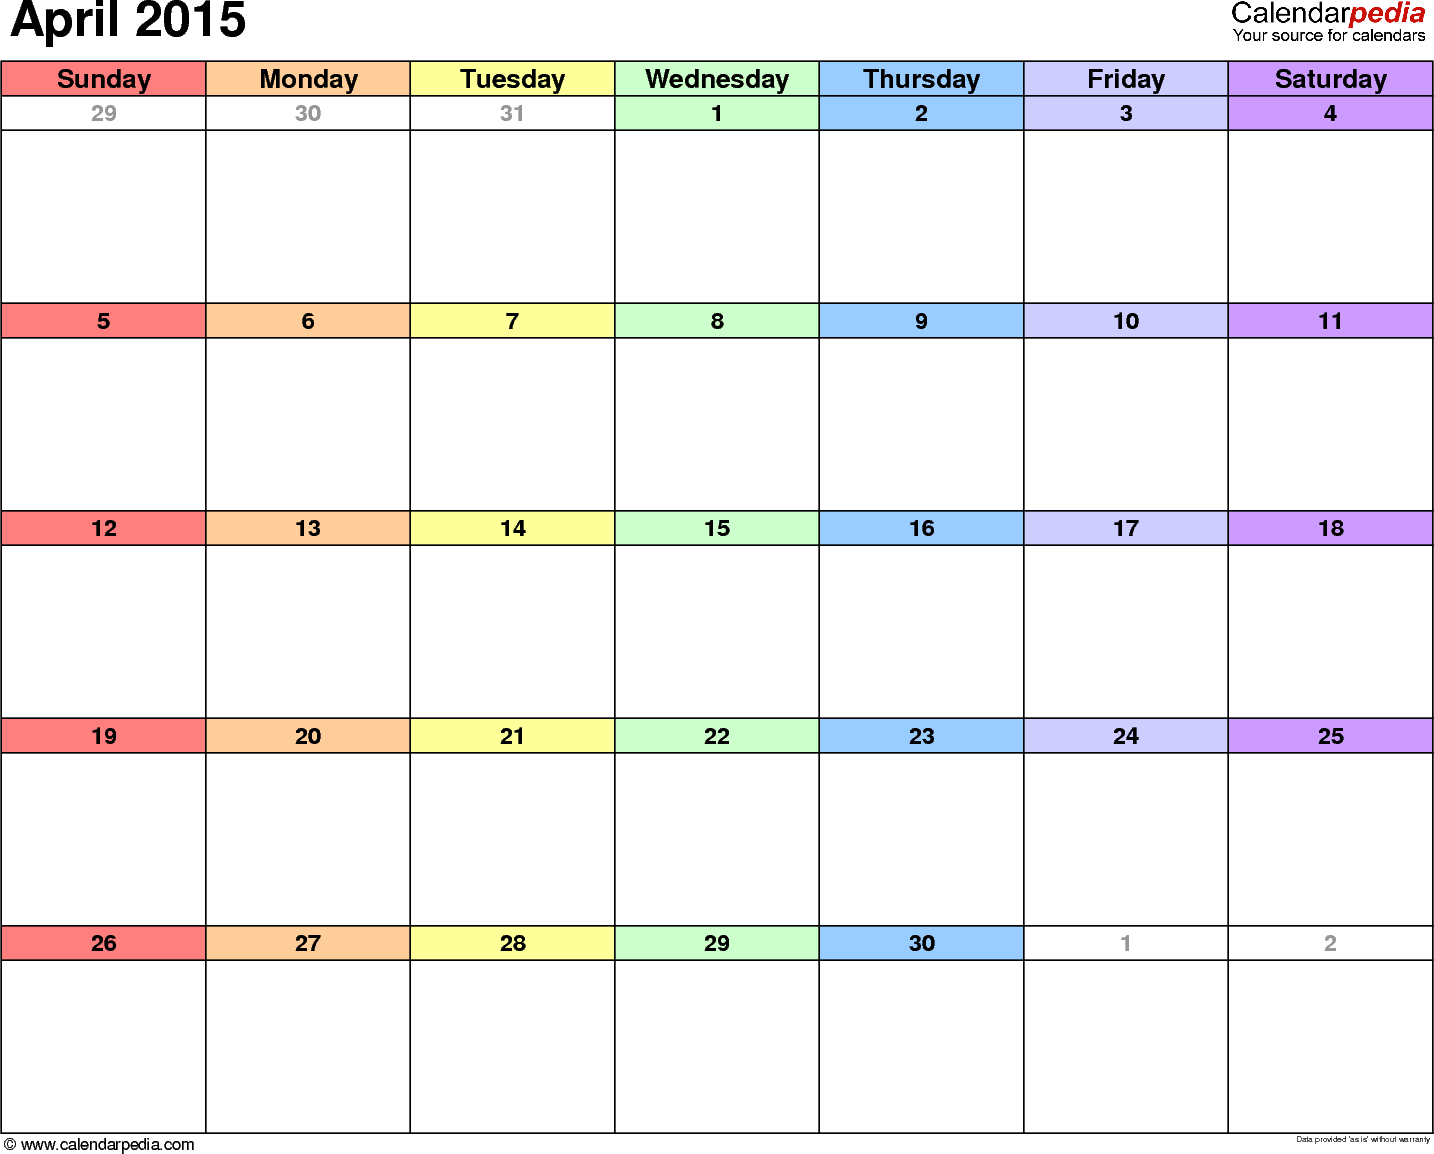 fillable calendars 2015